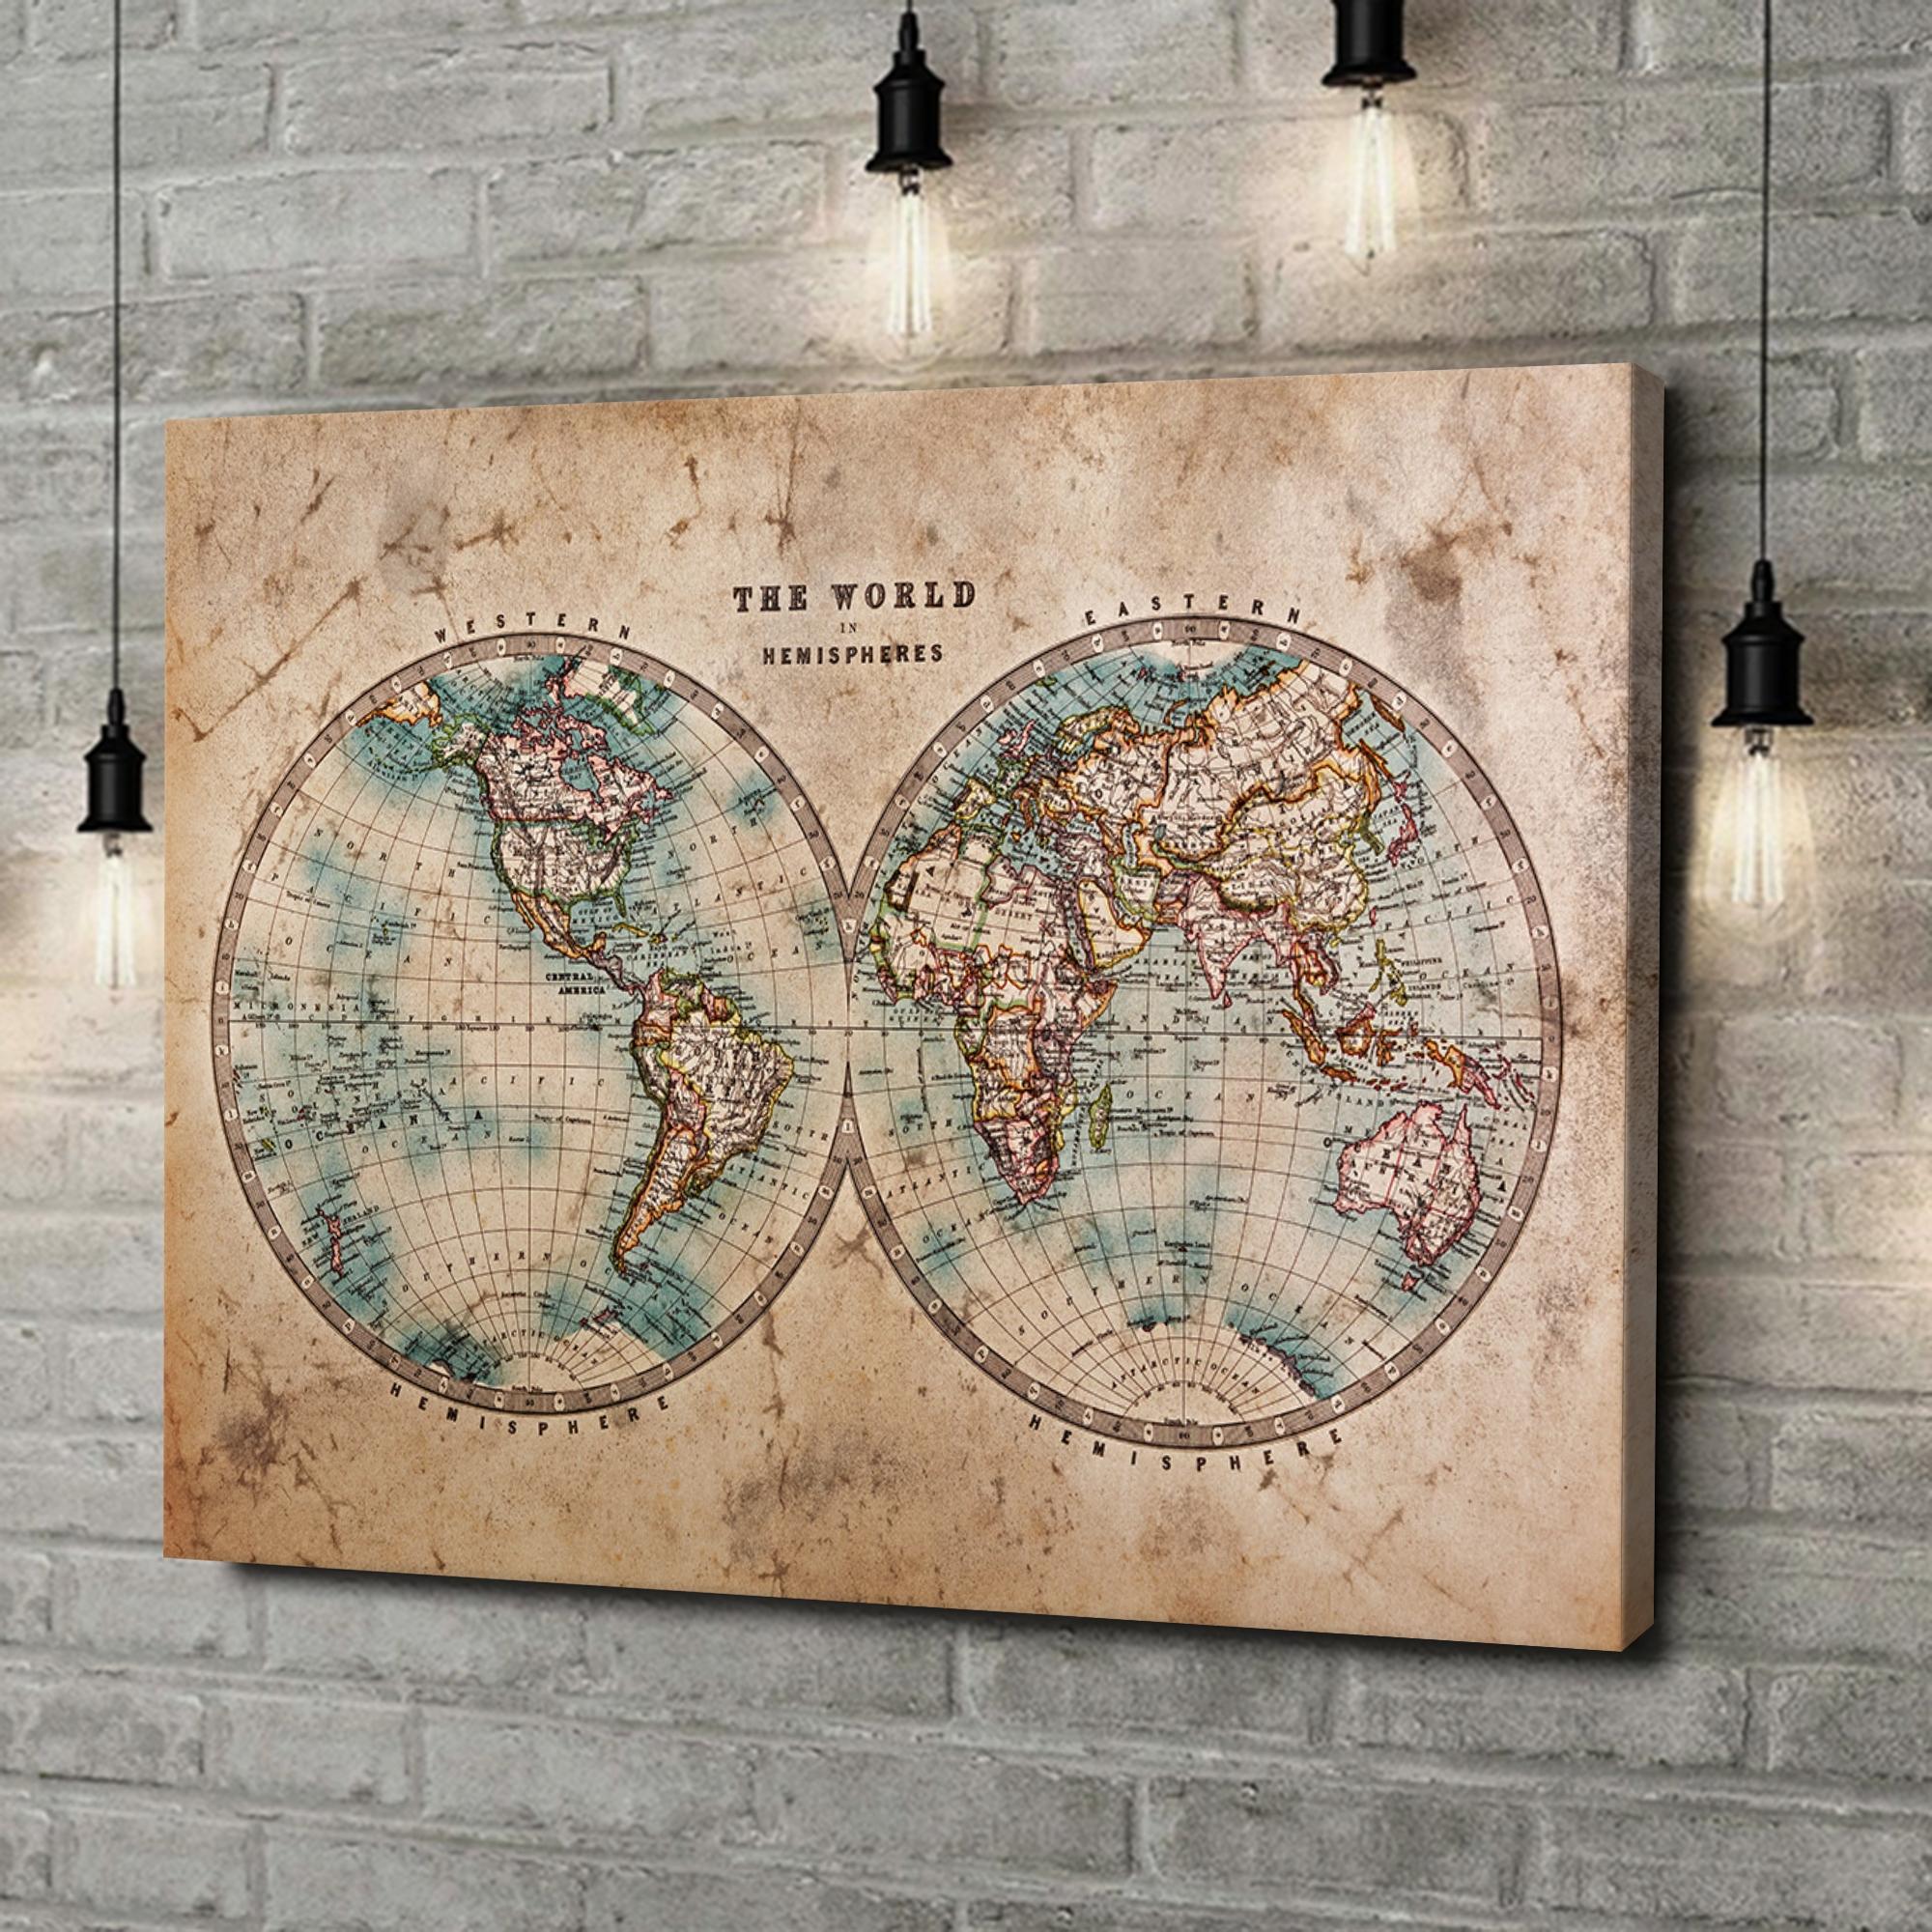 Leinwandbild personalisiert Weltkarte